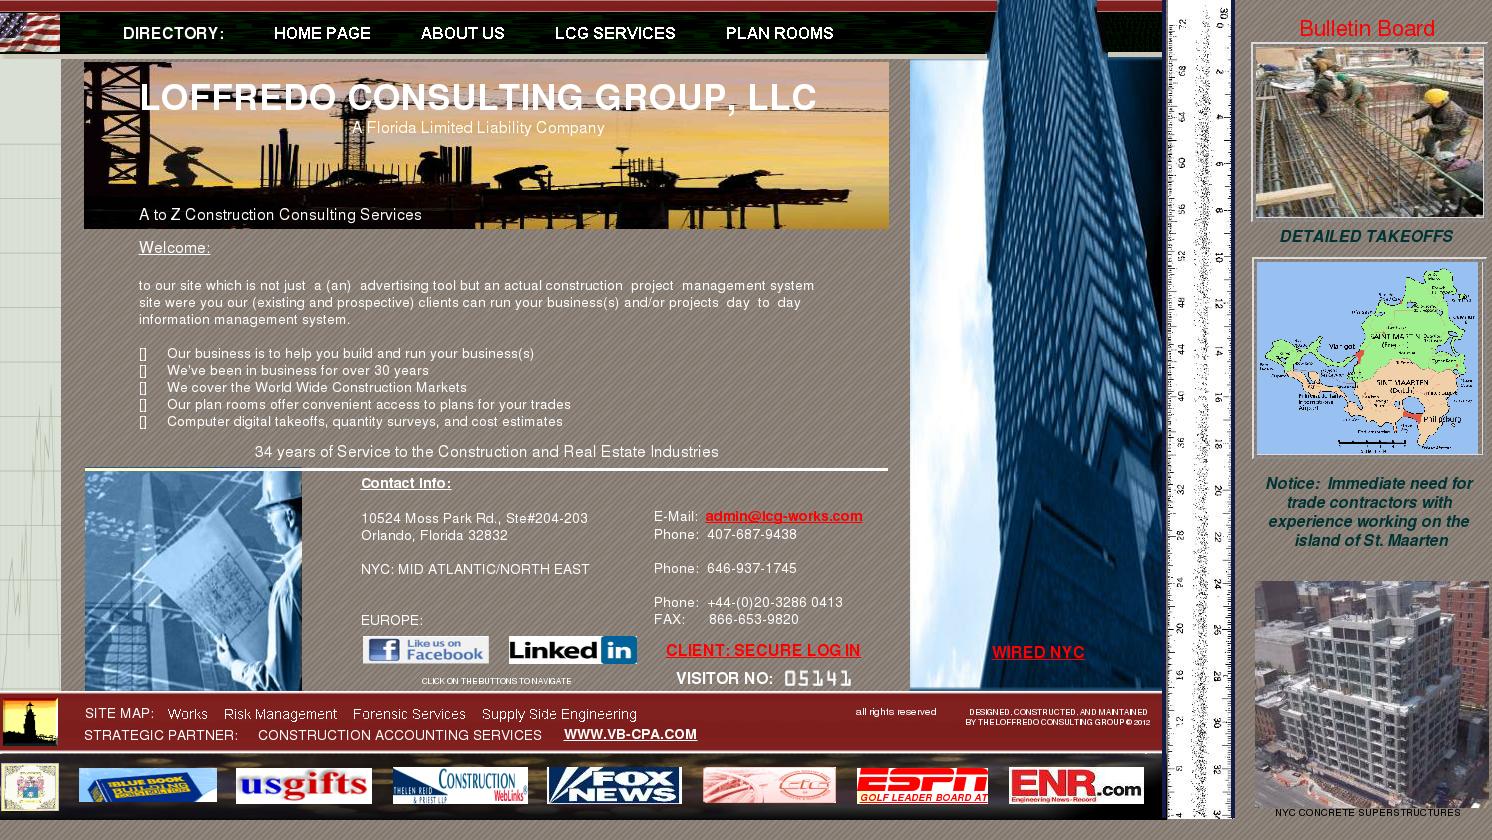 The Loffredo Consulting Group Competitors, Revenue and